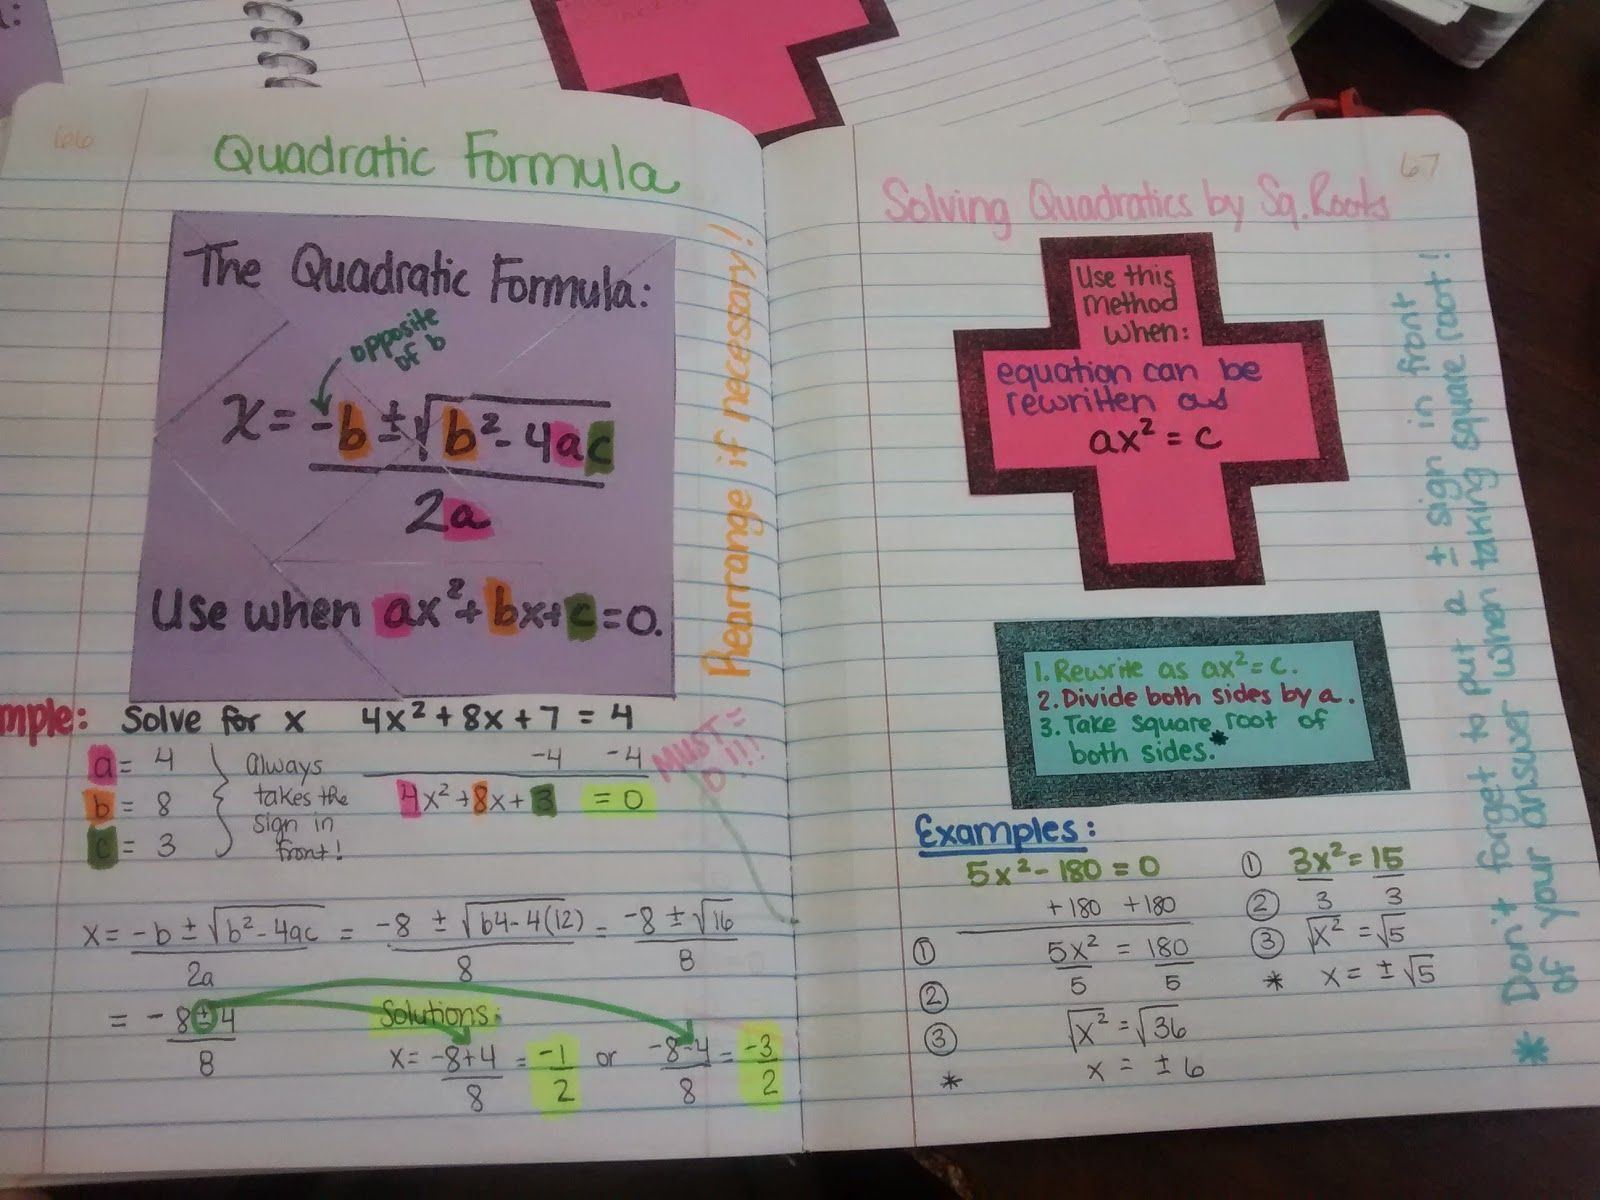 Algebra 2 Unit 3 Was All About Solving Quadratic Equations